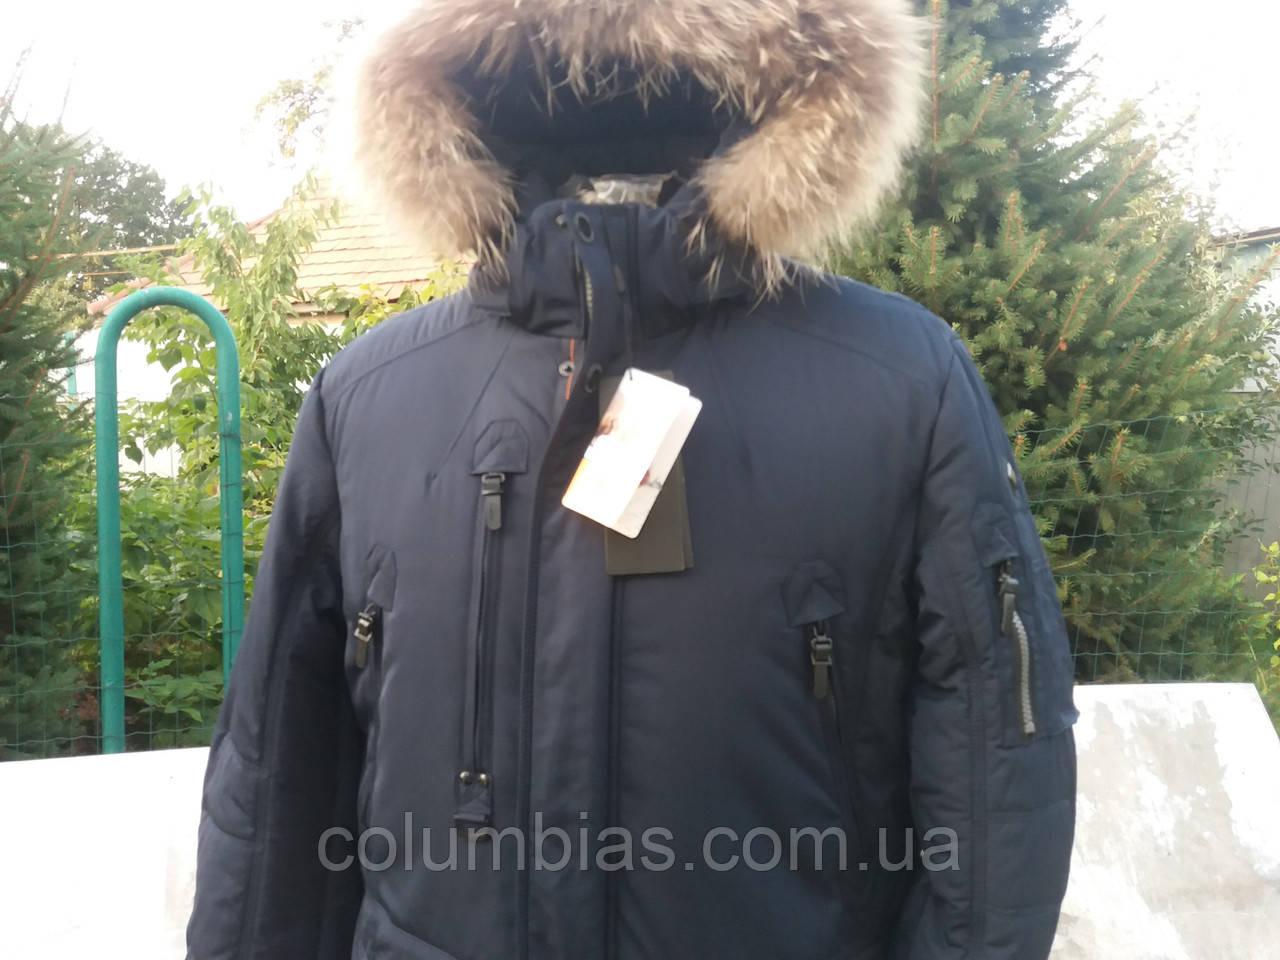 Зимняя куртка для мужчин производства Польша